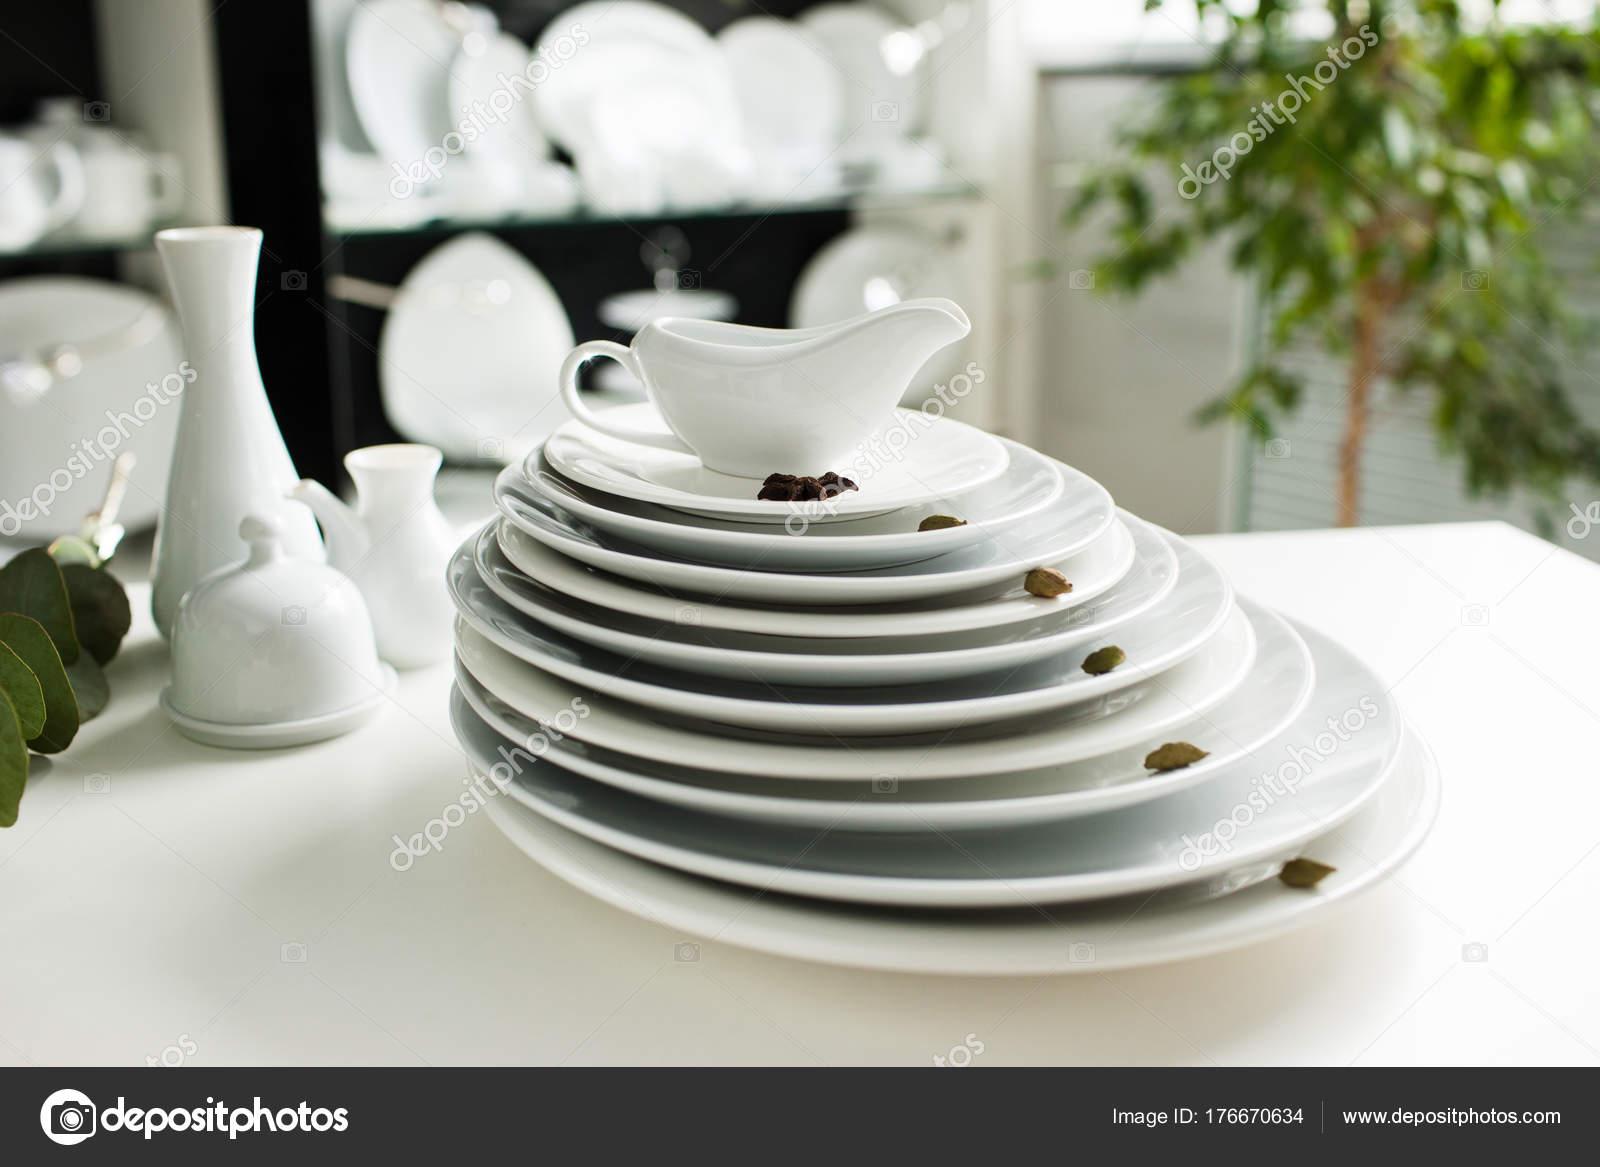 Restaurant white tableware assortment. Stylish crockery set. Purity and luxury concept \u2014 Photo by golubovystock & white tableware stylish luxury crockery \u2014 Stock Photo ...